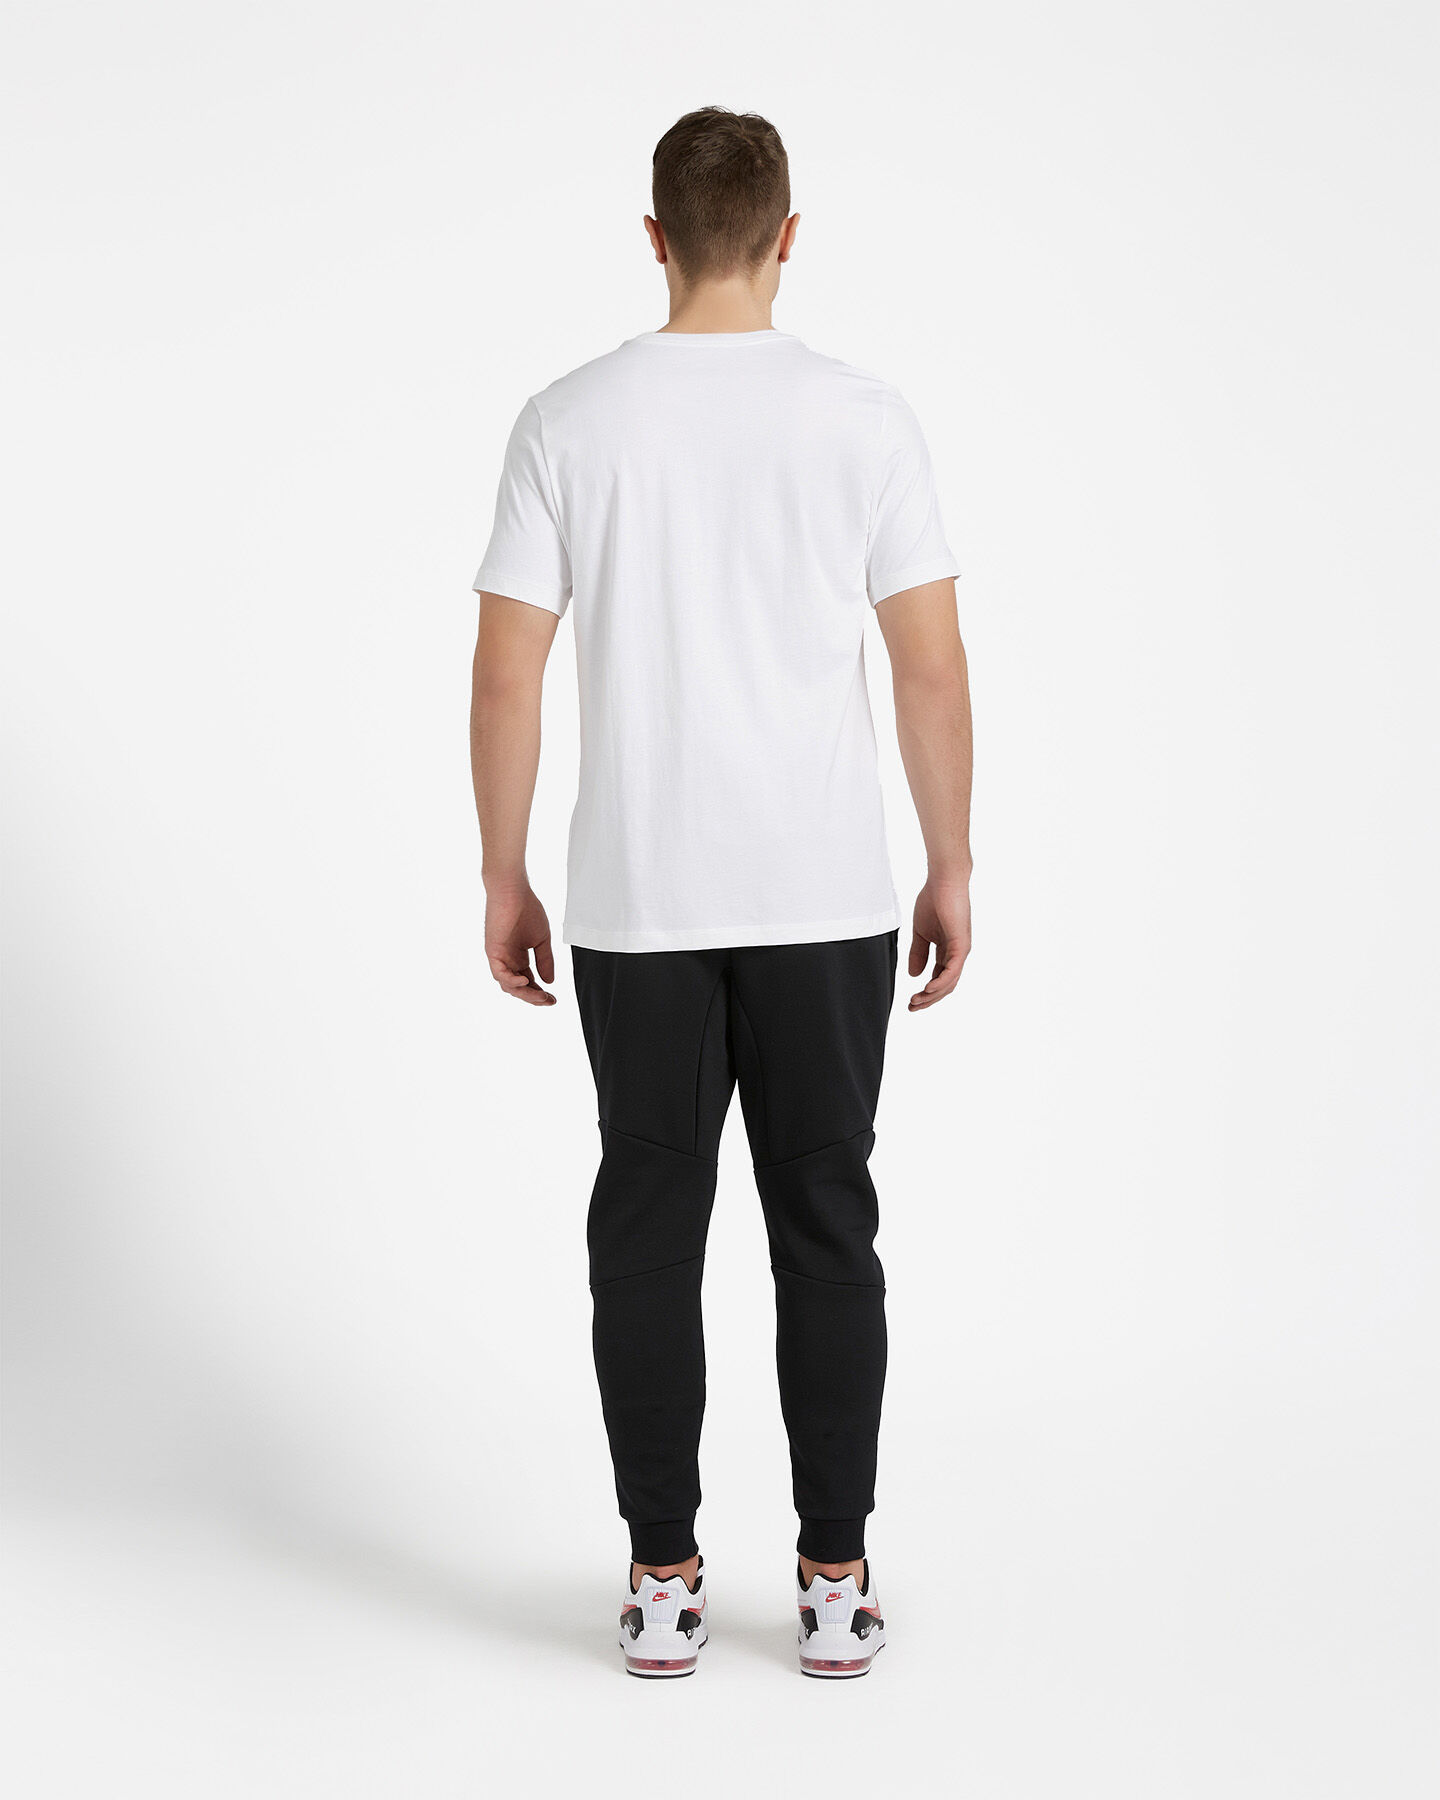 T-Shirt NIKE AIR PHOTO M S5164801 scatto 2